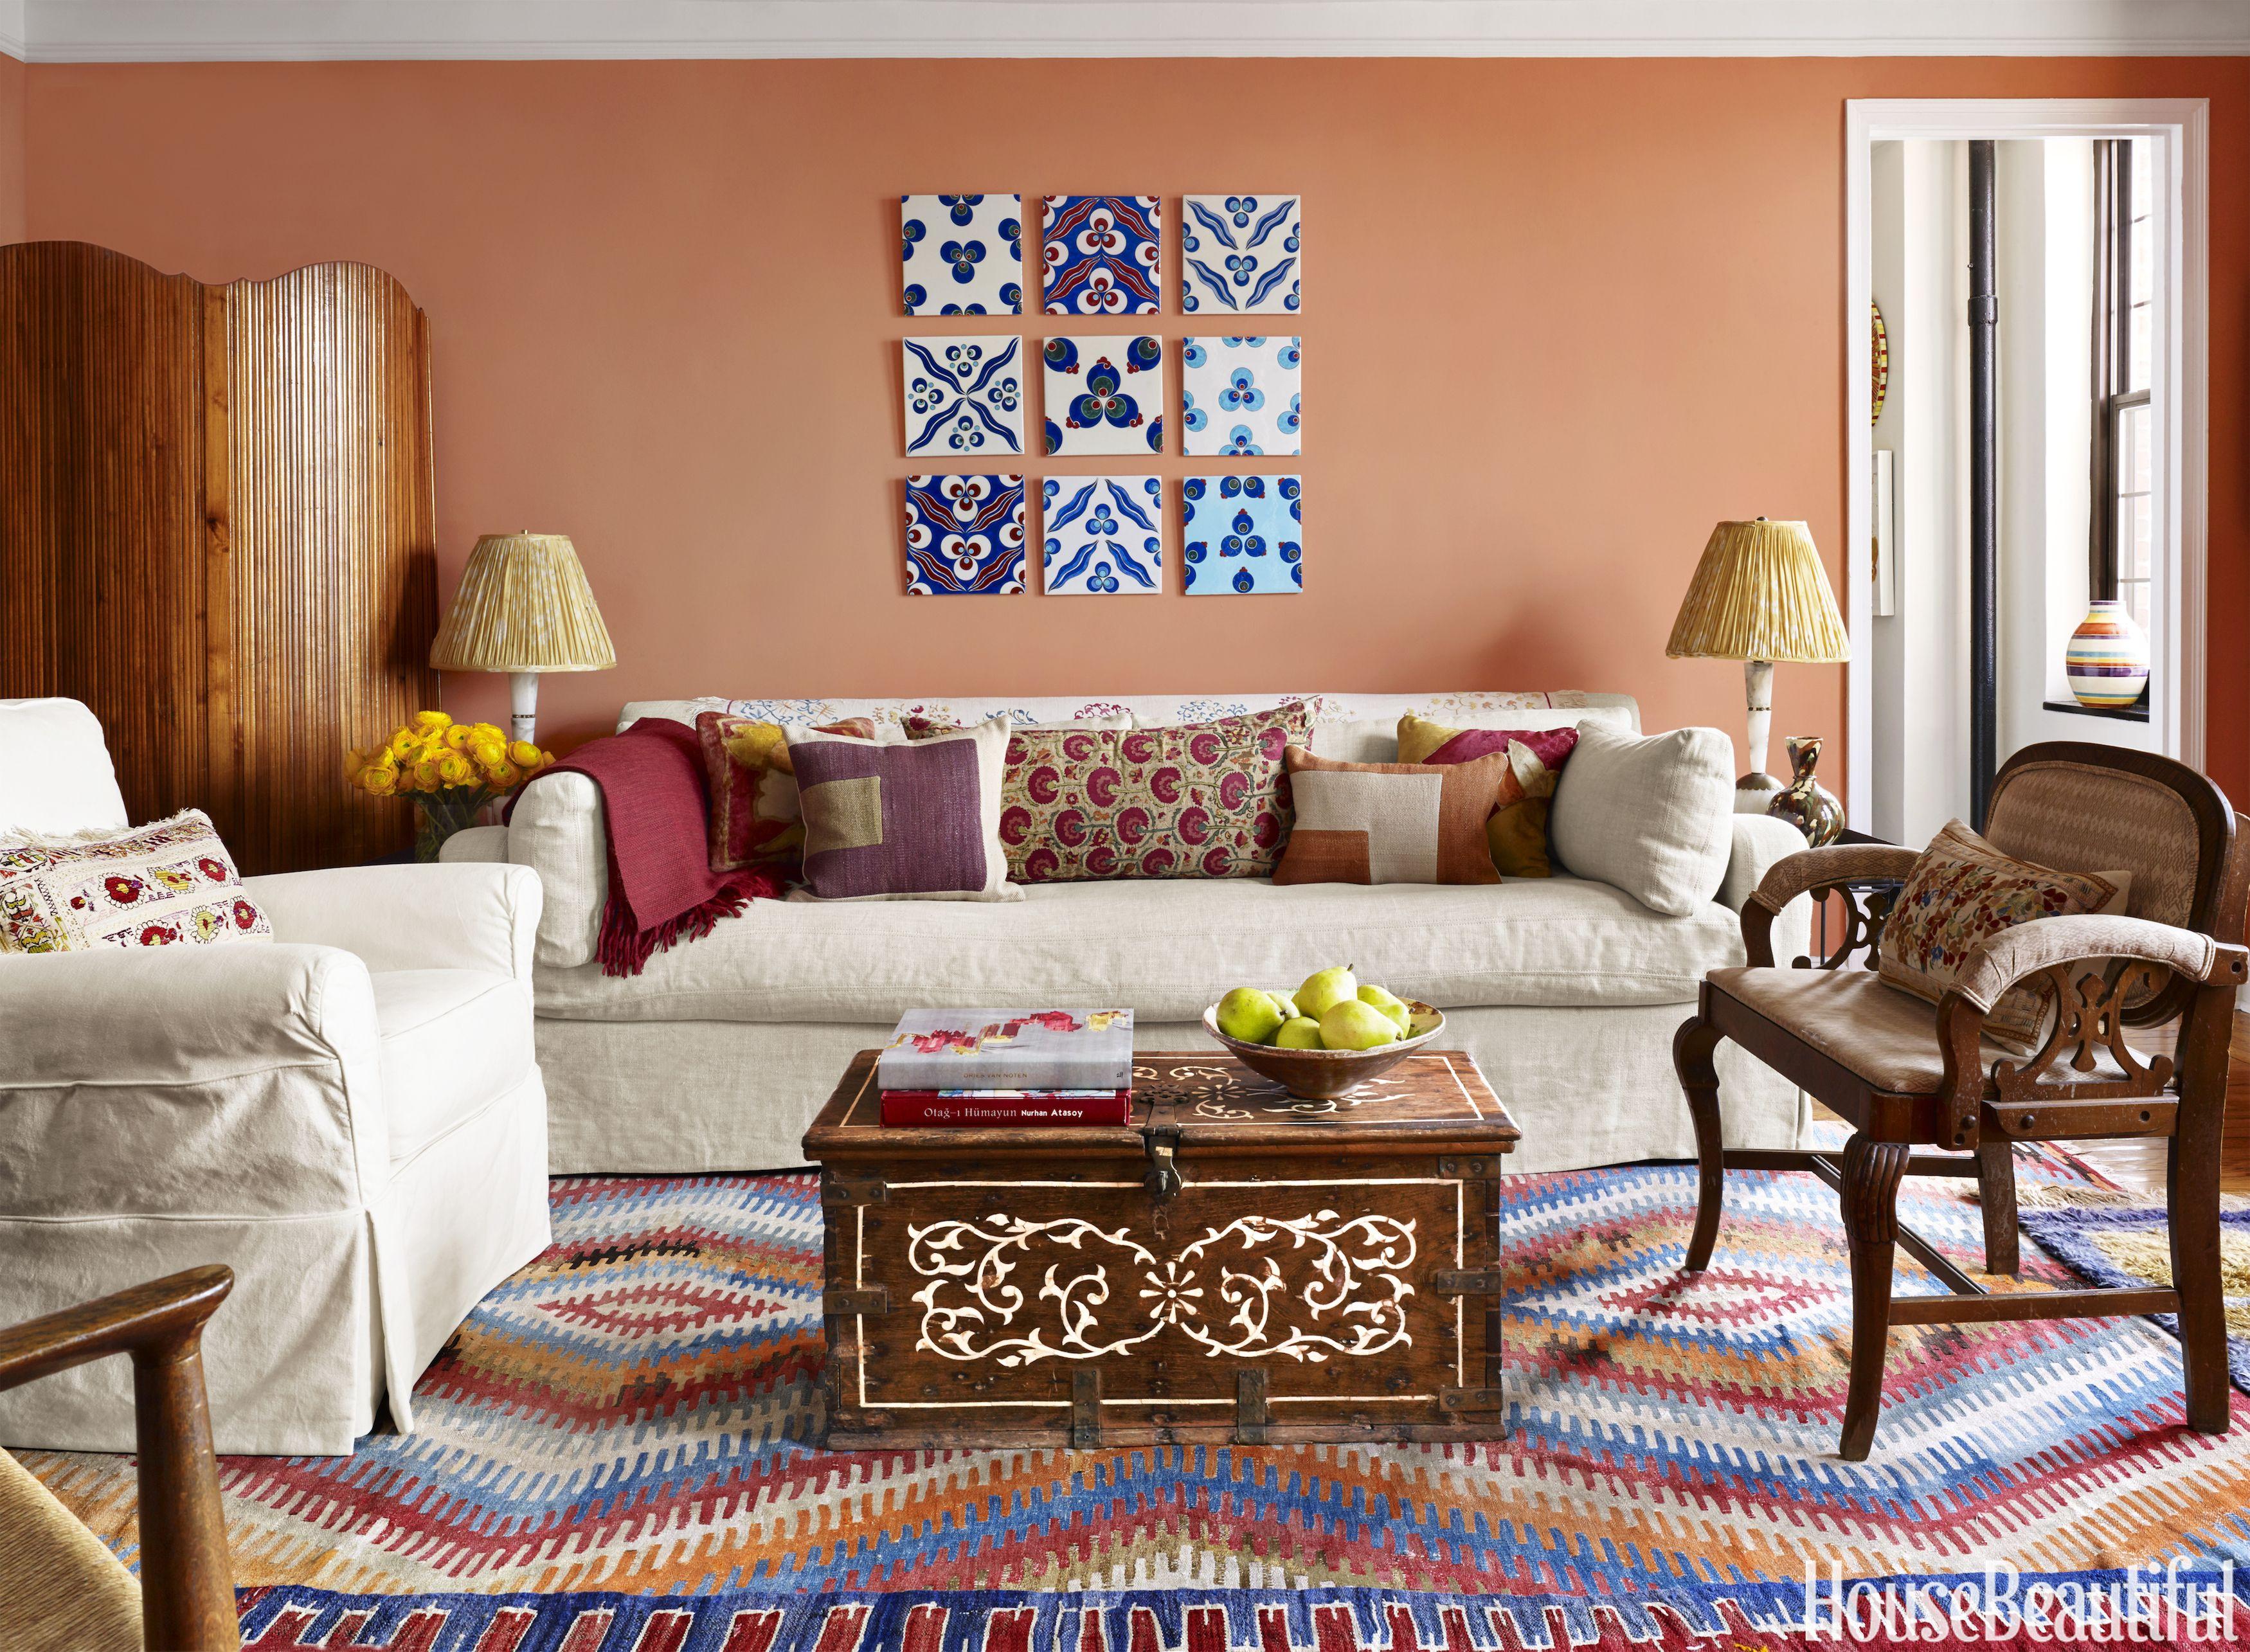 sara bengur living room & 20 Bohemian Decor Ideas - Boho Room Style Decorating and Inspiration